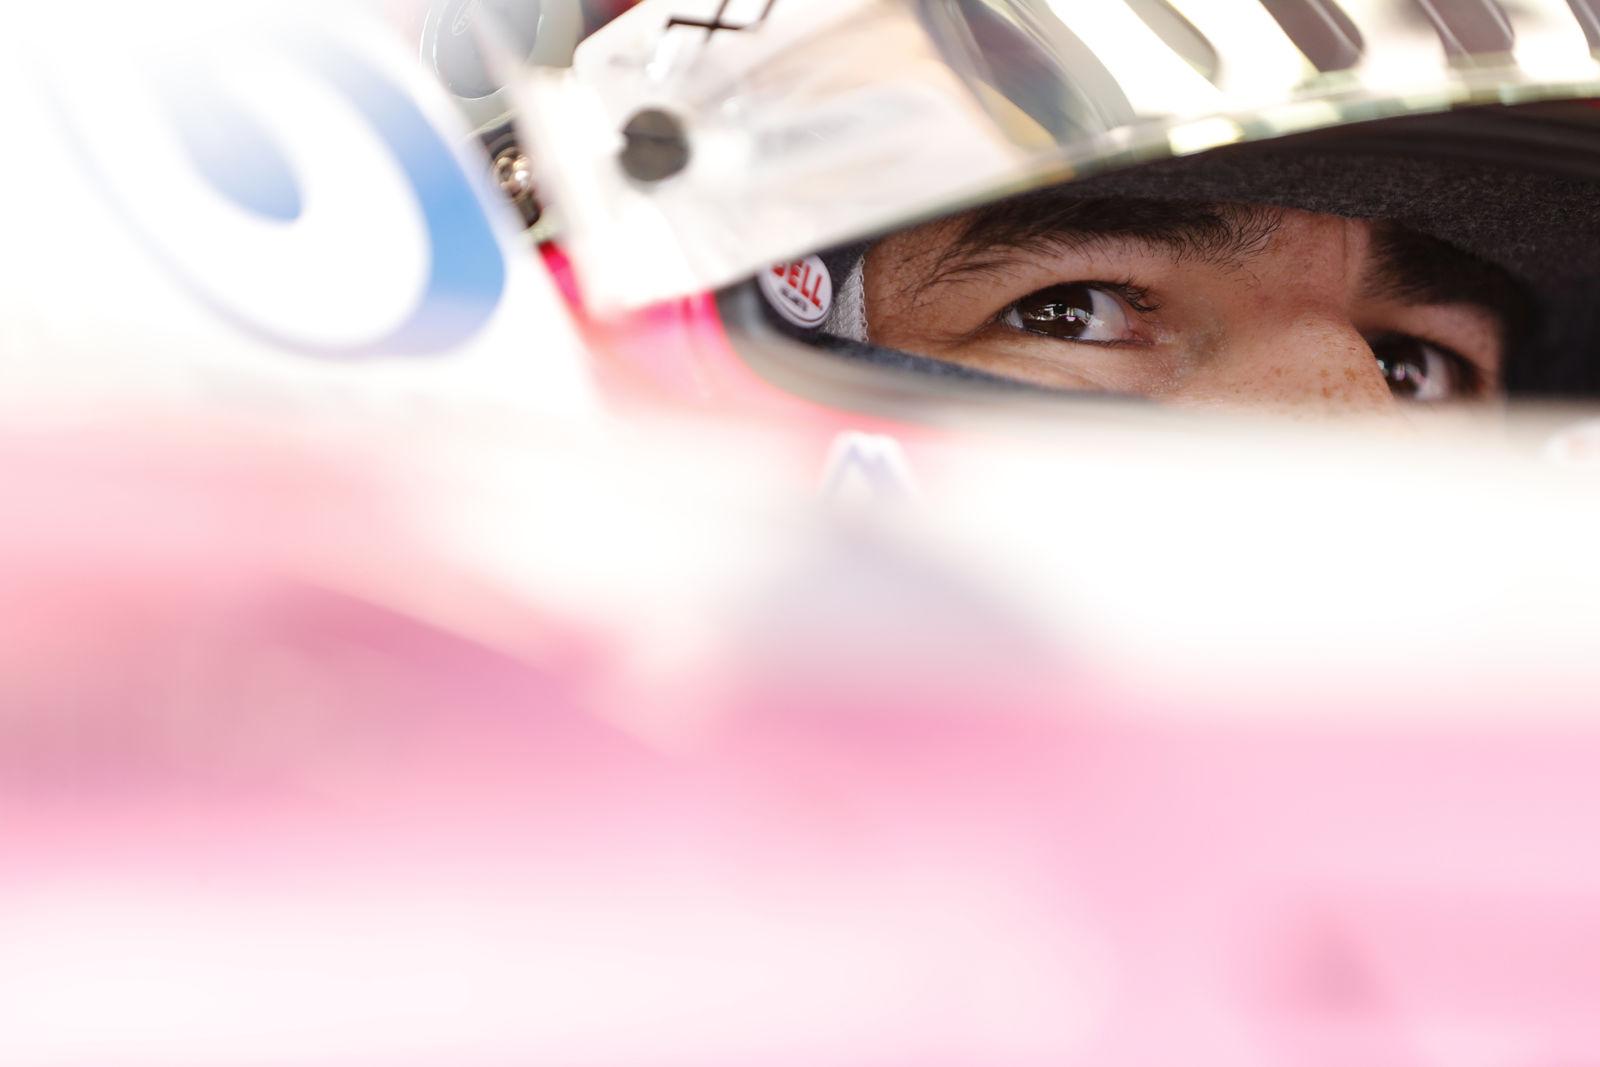 Positif au COVID-19, Sergio Perez se dit asymptomatique 1